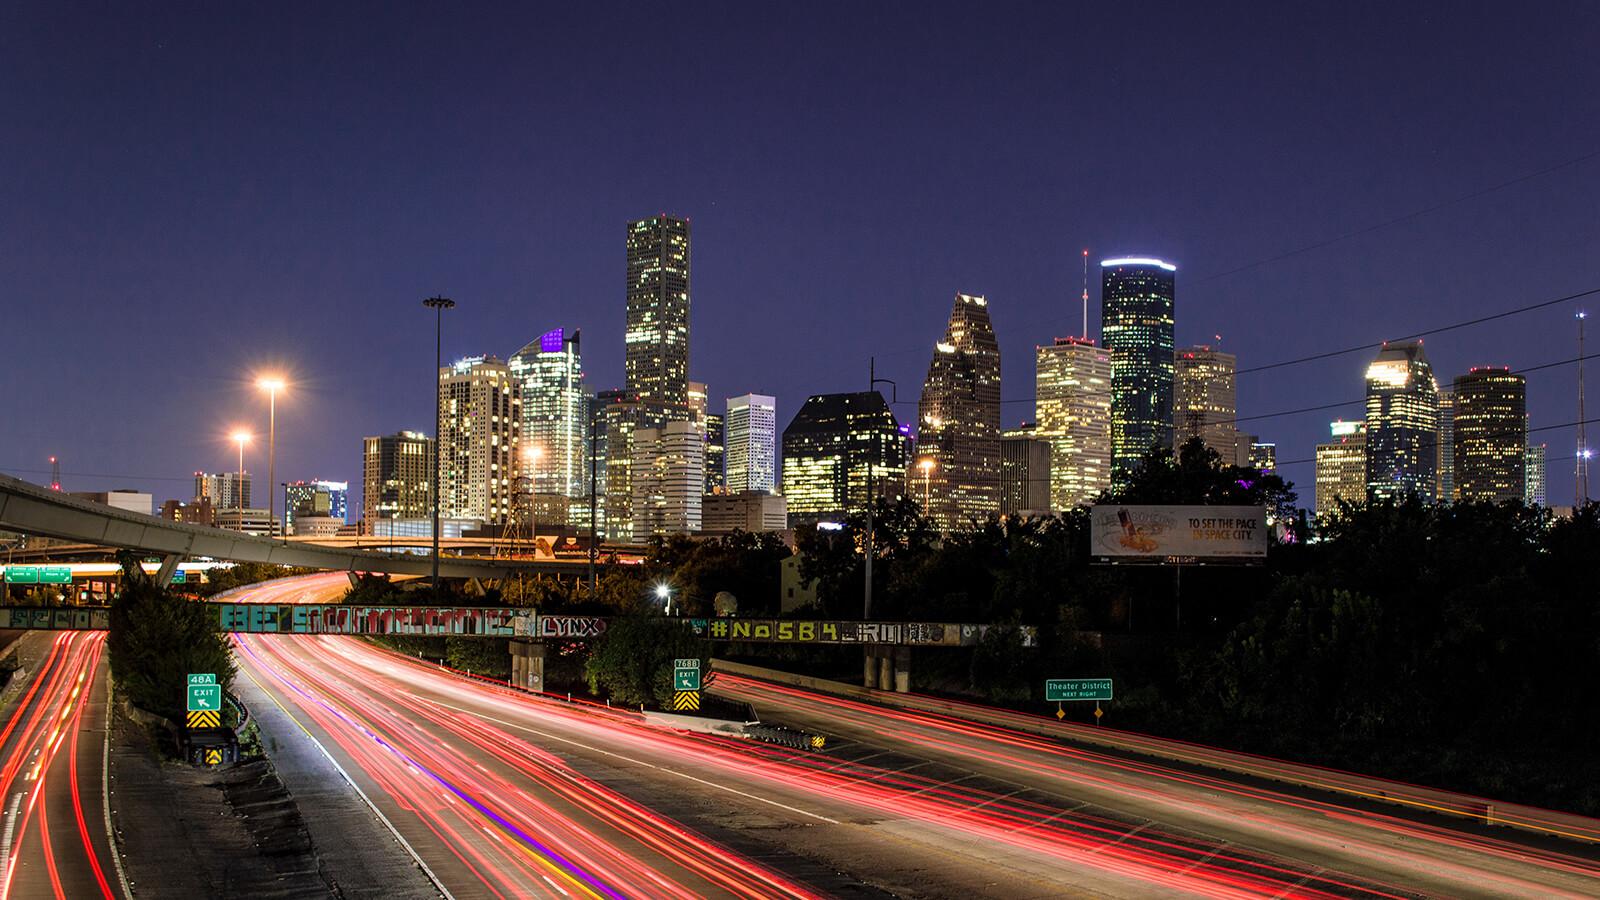 Long exposure of the Houston, Texas skyline at night